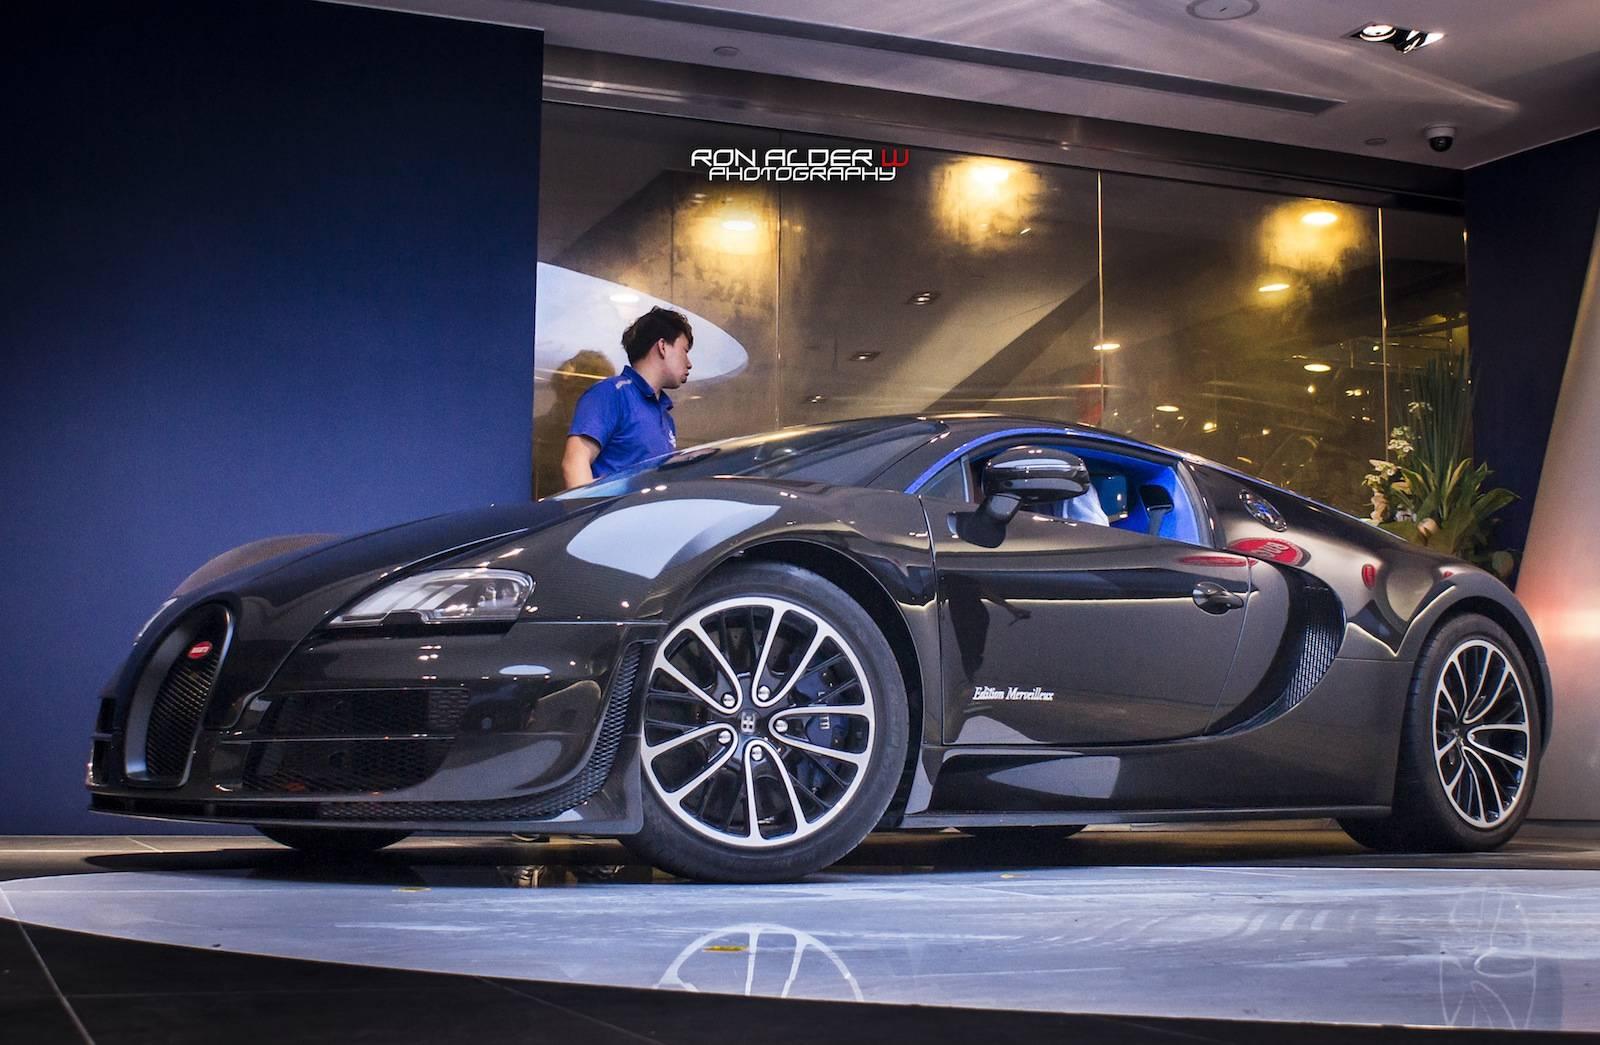 bugatti veyron super sport merveilleux edition in hong kong gtspirit. Black Bedroom Furniture Sets. Home Design Ideas